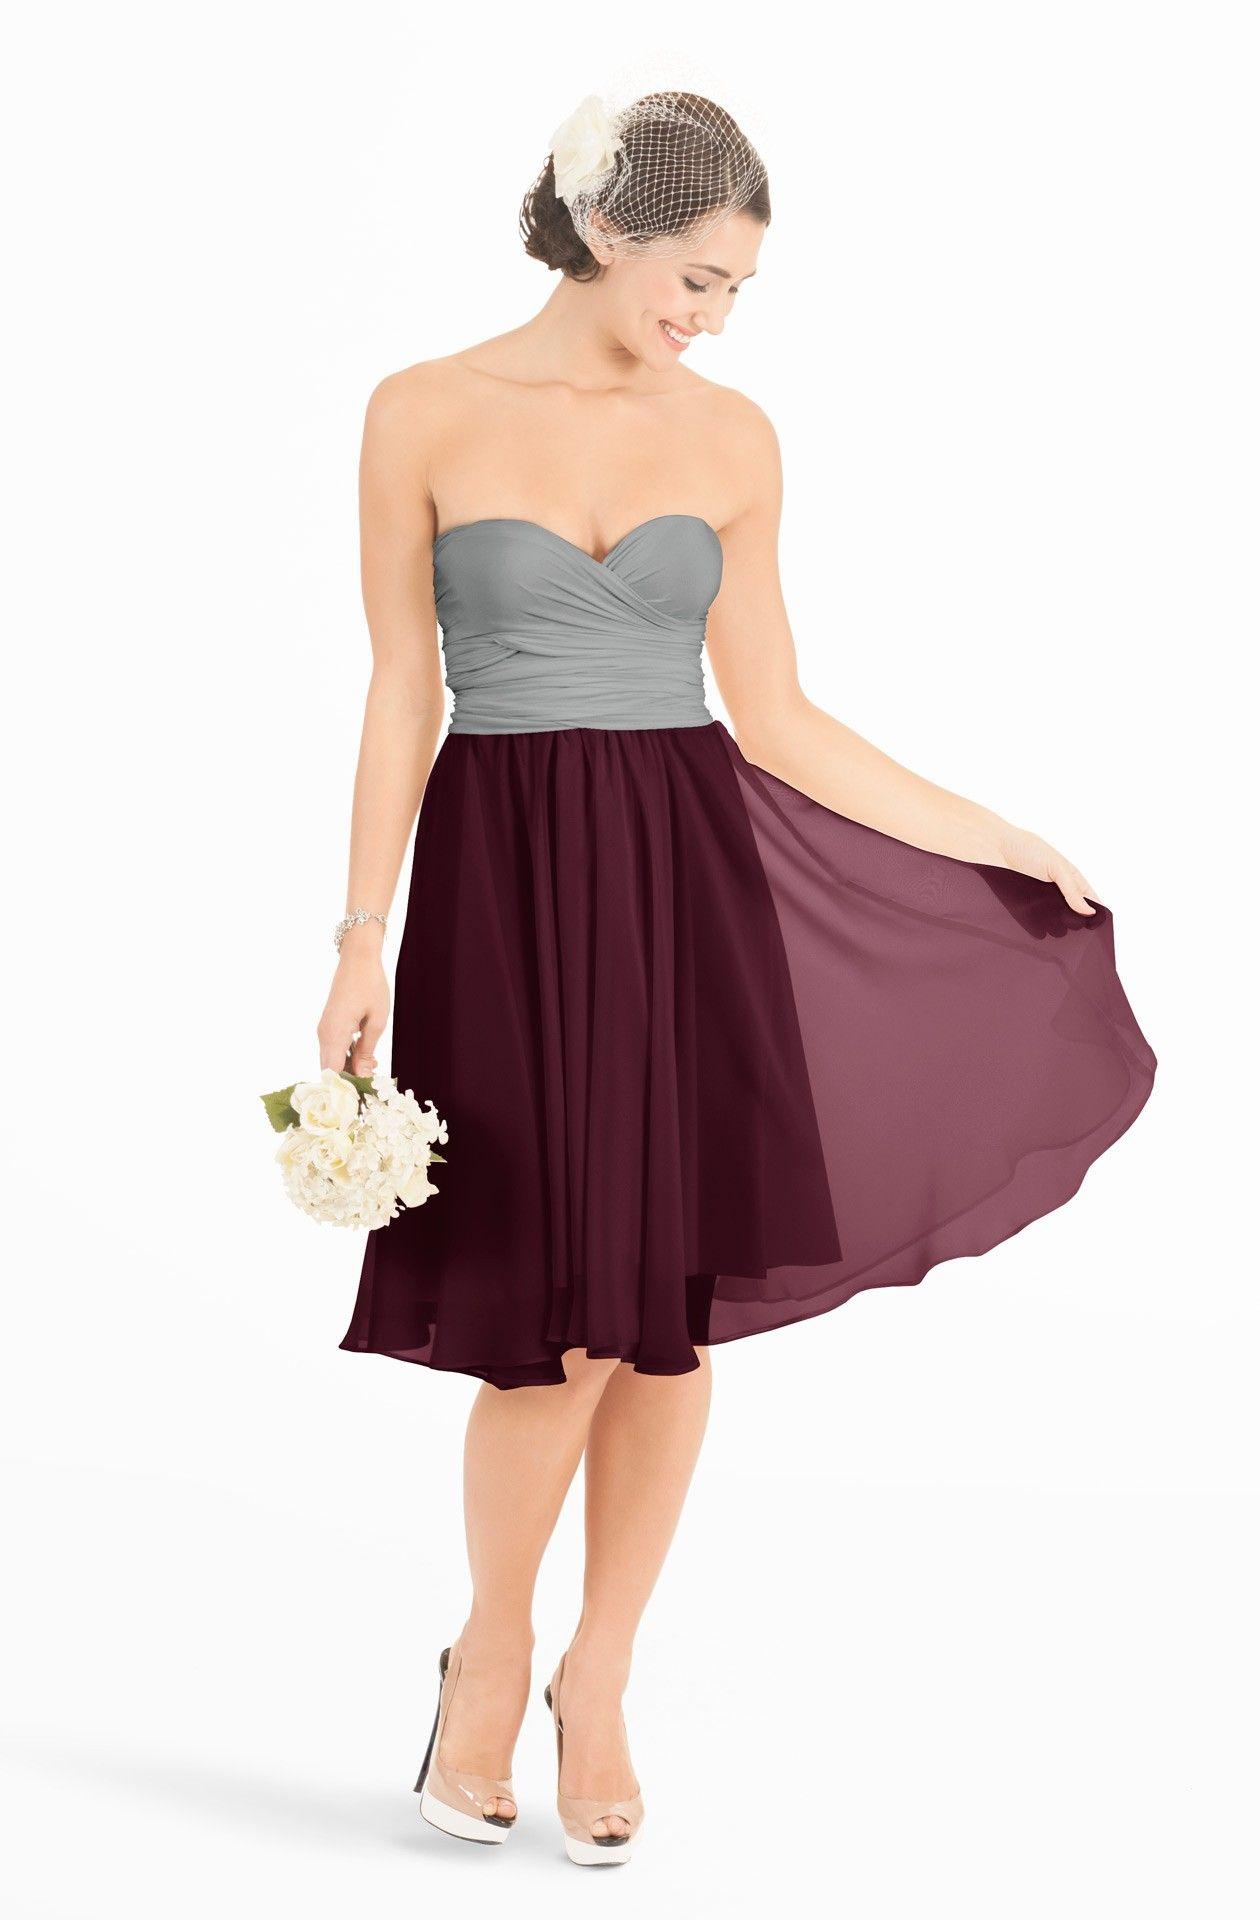 Hana burgundy wine midi chiffon overlay wedding colors burgundy